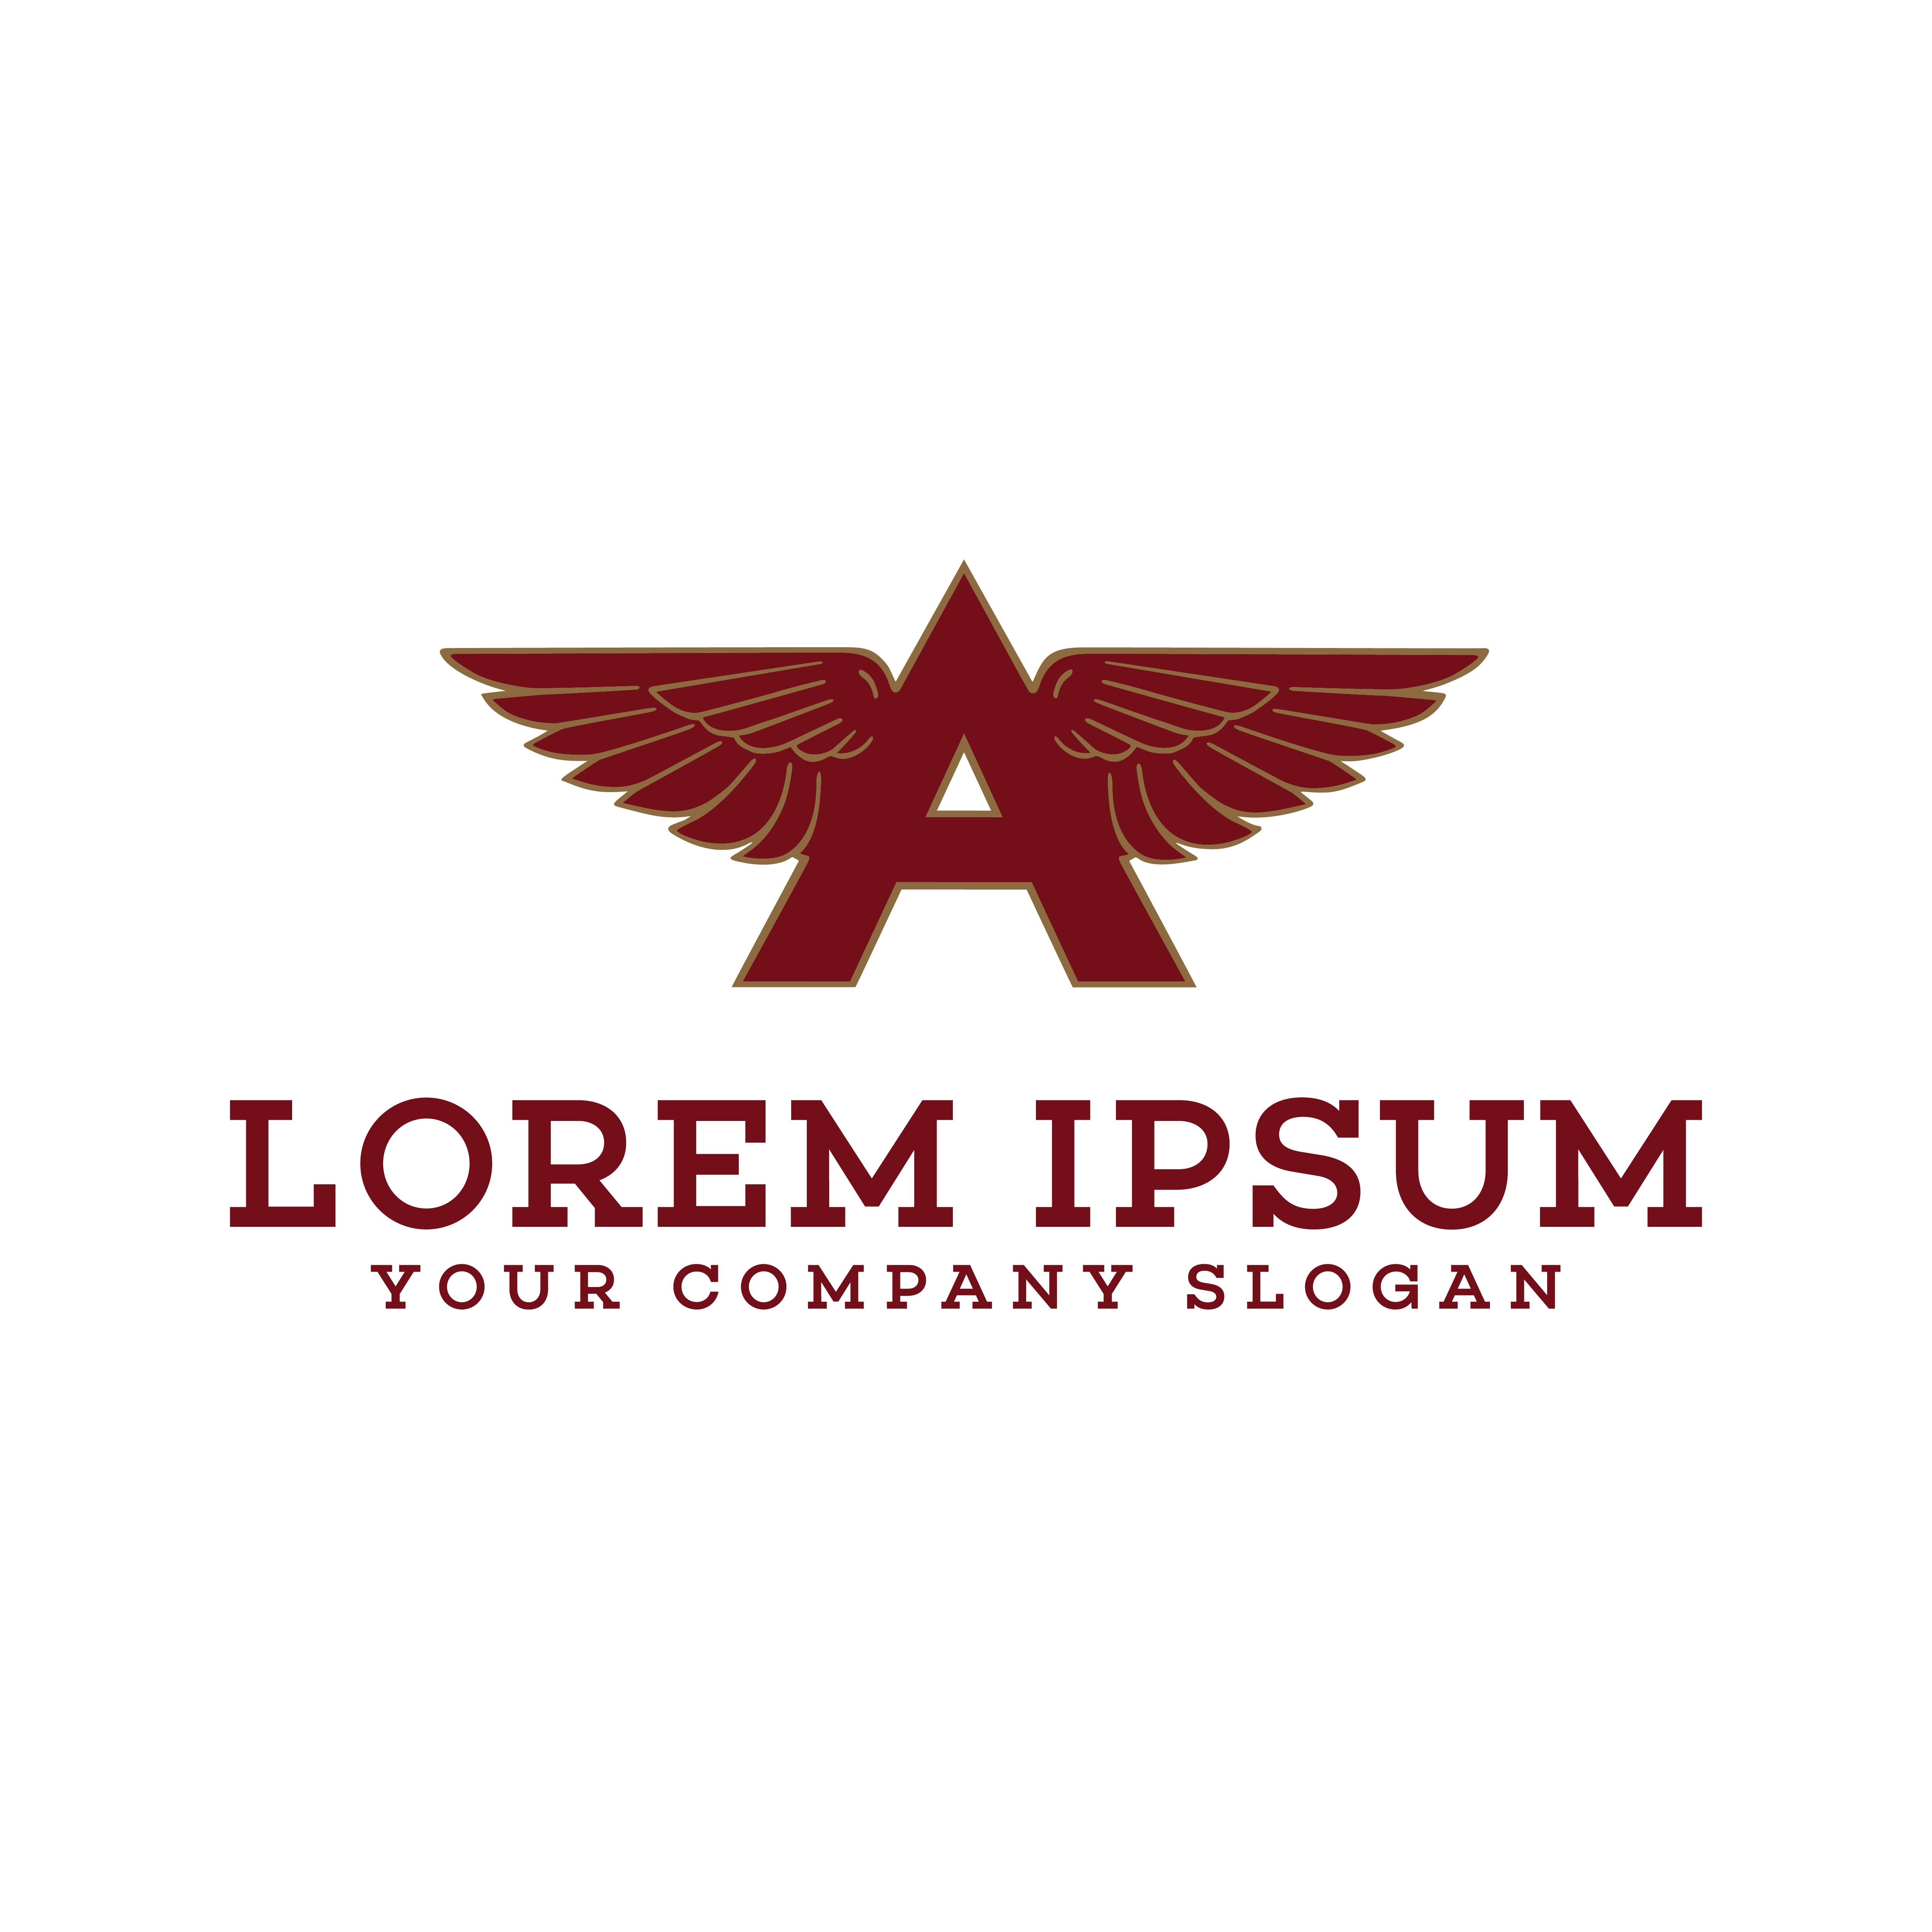 Modern Letter K Logo Concept:  Letter A Wings Logo Design Concept Template